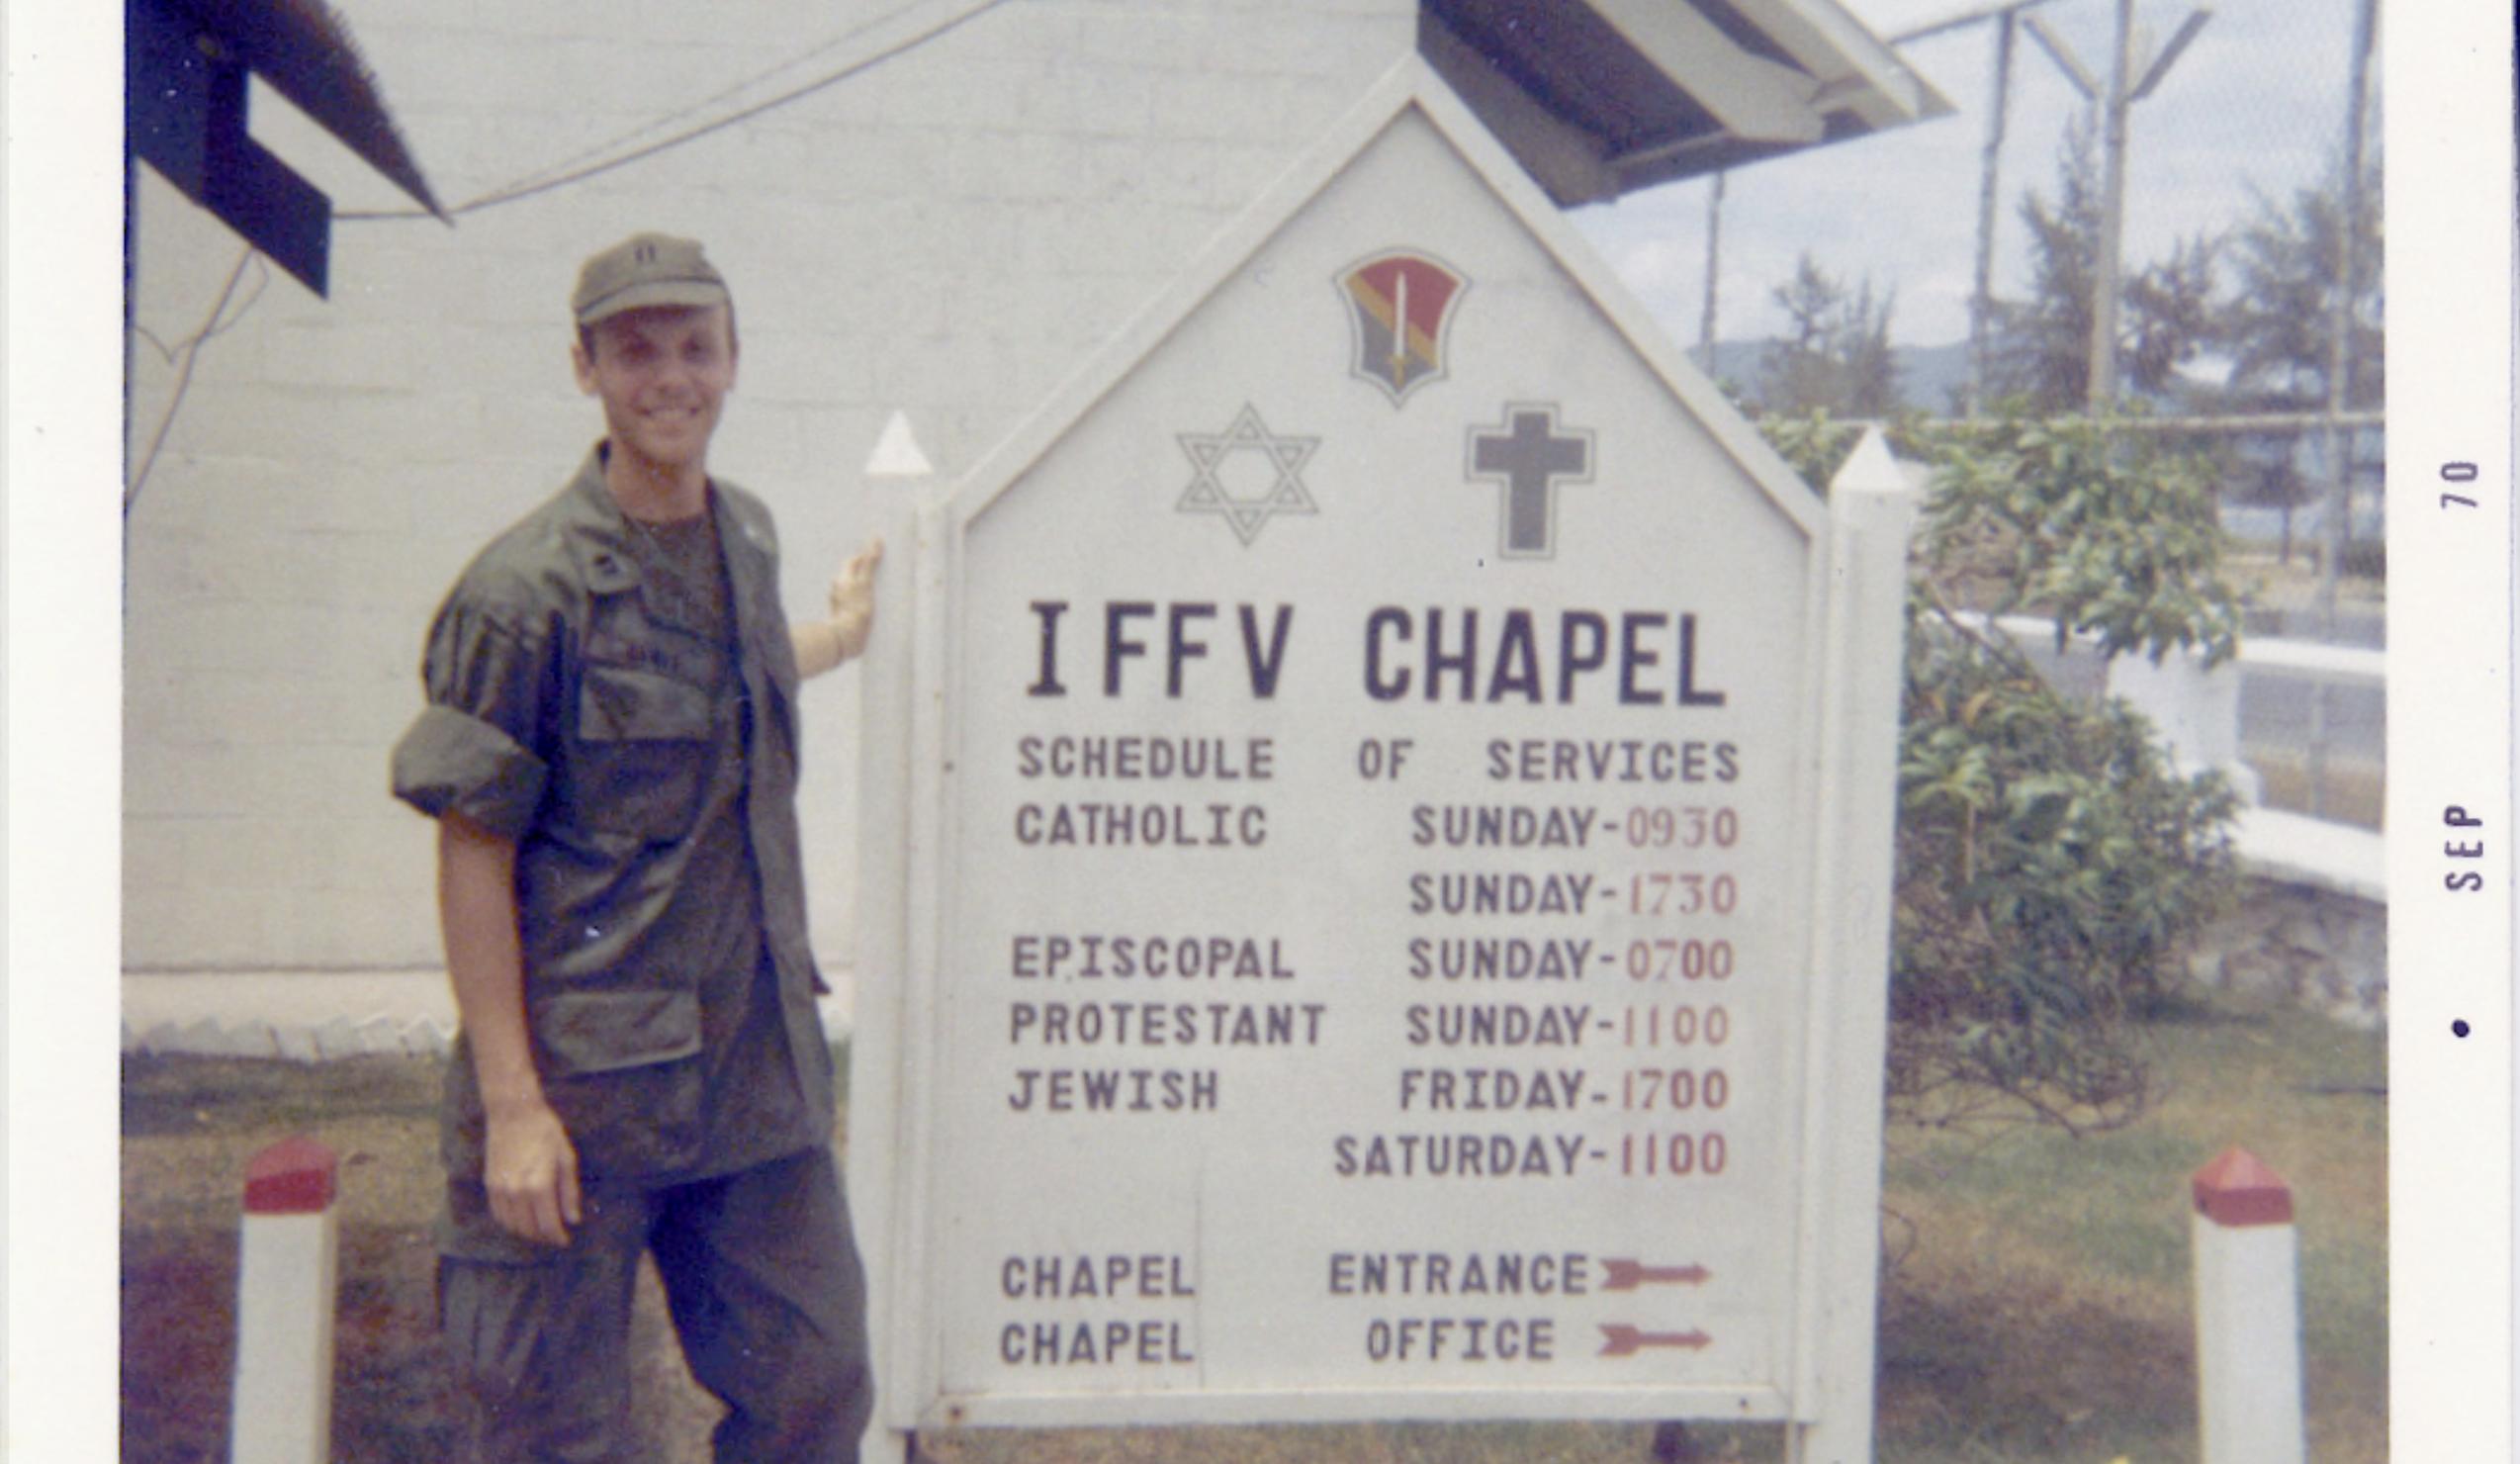 Rabbi Sheldon Lewis in uniform in Vietnam during the Vietnam War.